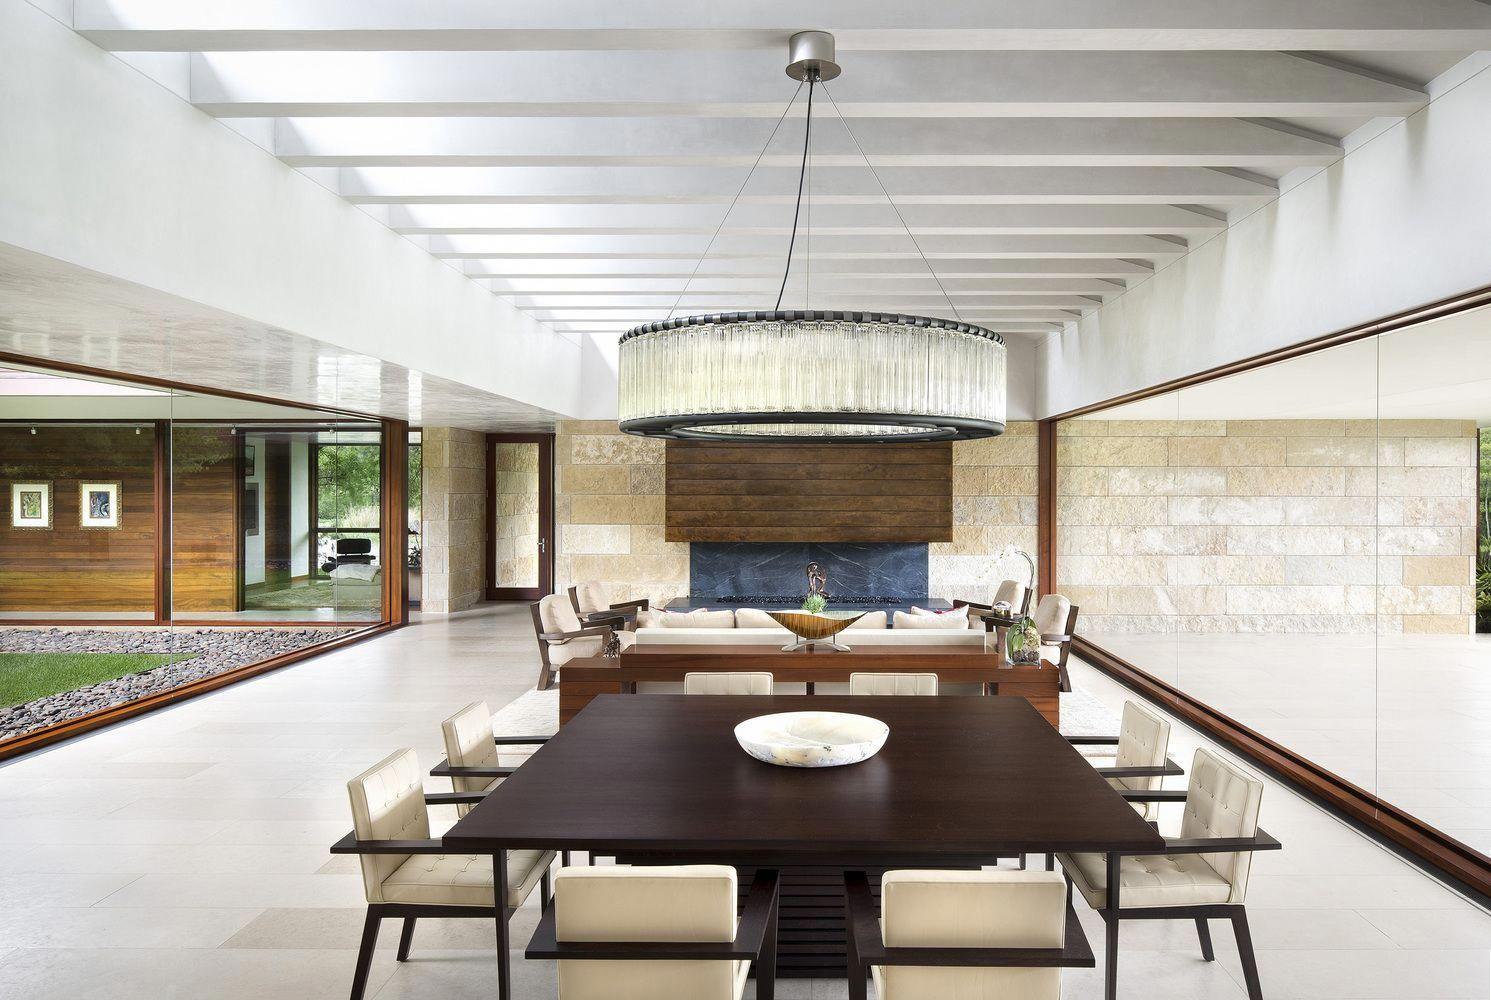 Residence paul finkel piston design interiorzendesign also rh pinterest